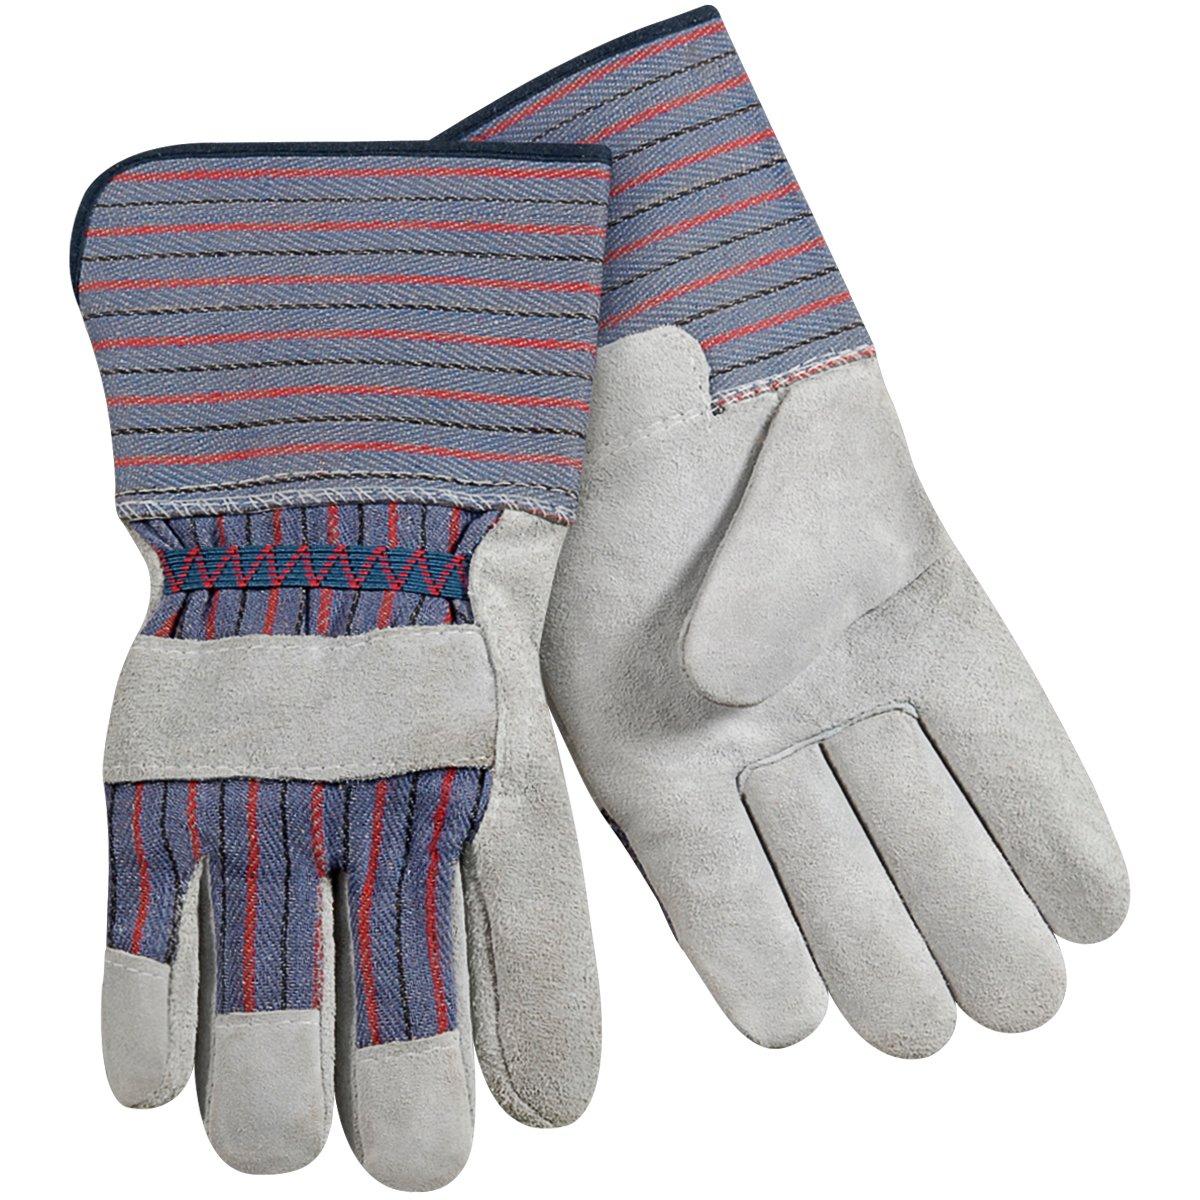 Steiner SPC03-L Leather Palm Work Gloves, Standard Shoulder Split Cowhide, 4-Inch Gauntlet Cuff, Large (12-Pack)